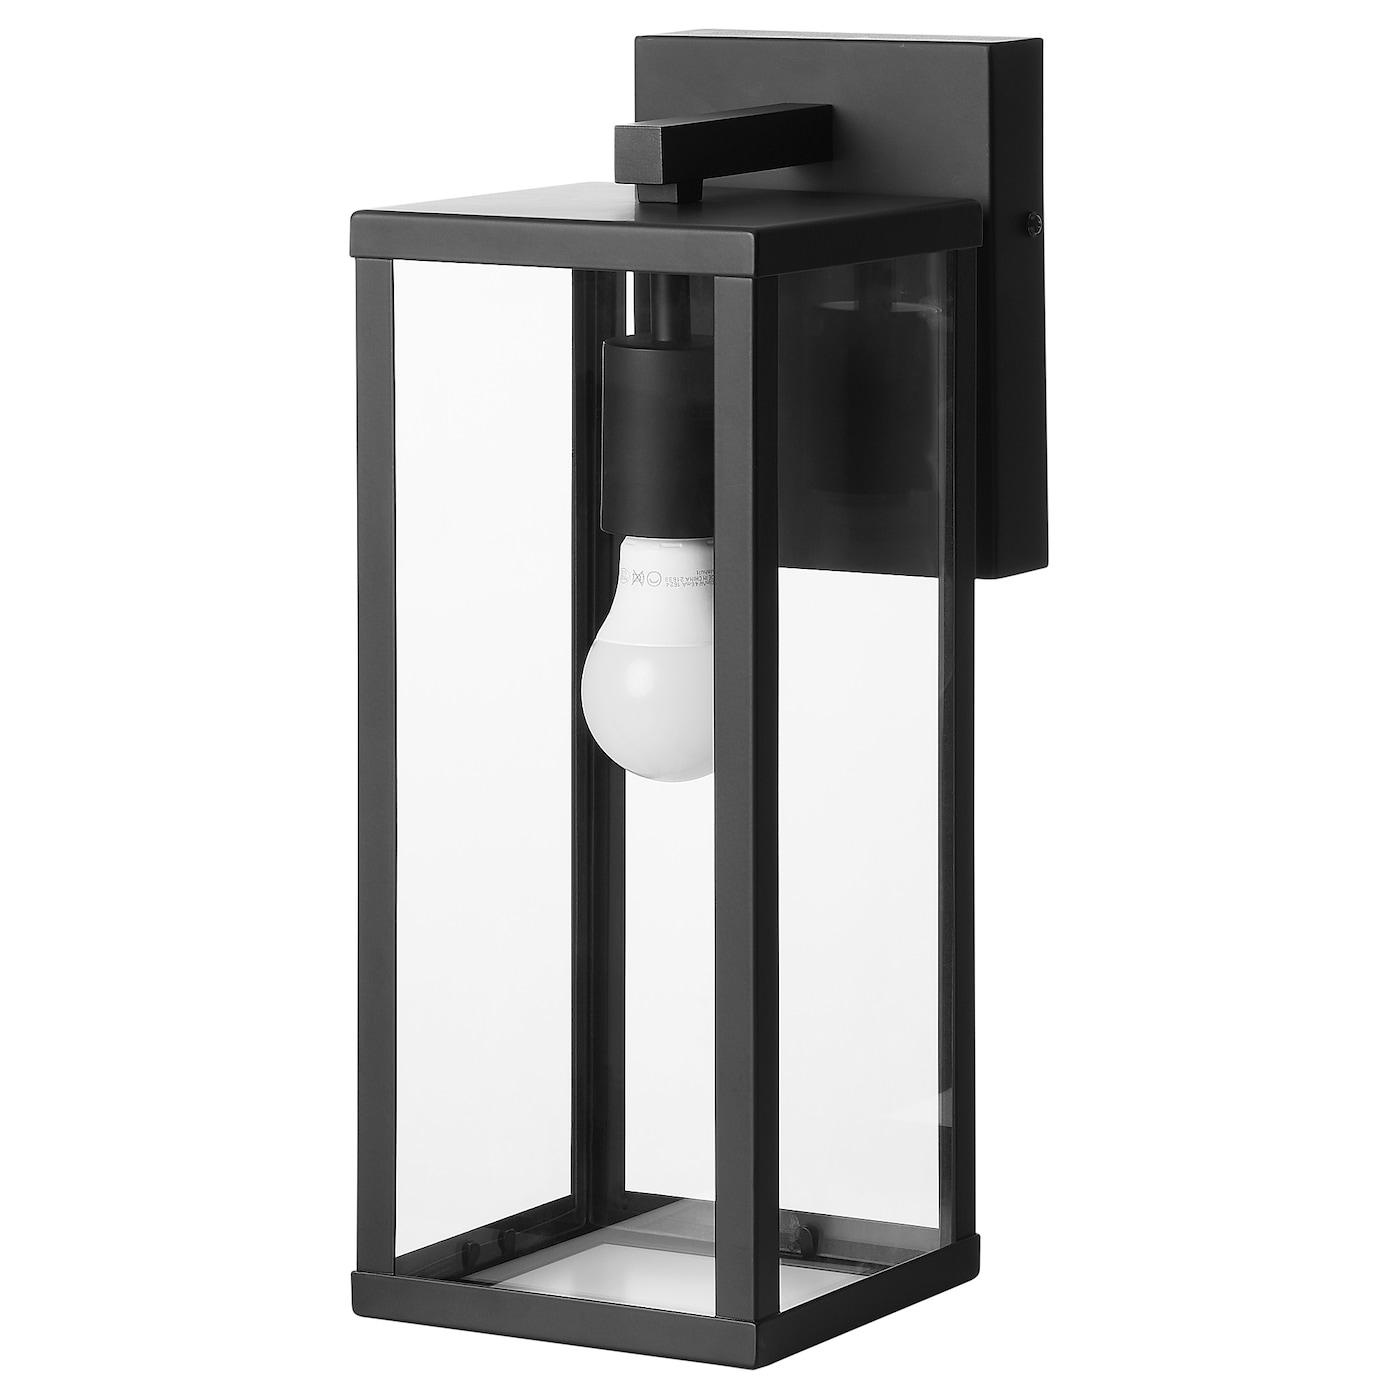 KANNLAND Wall lamp, outdoor black - IKEA